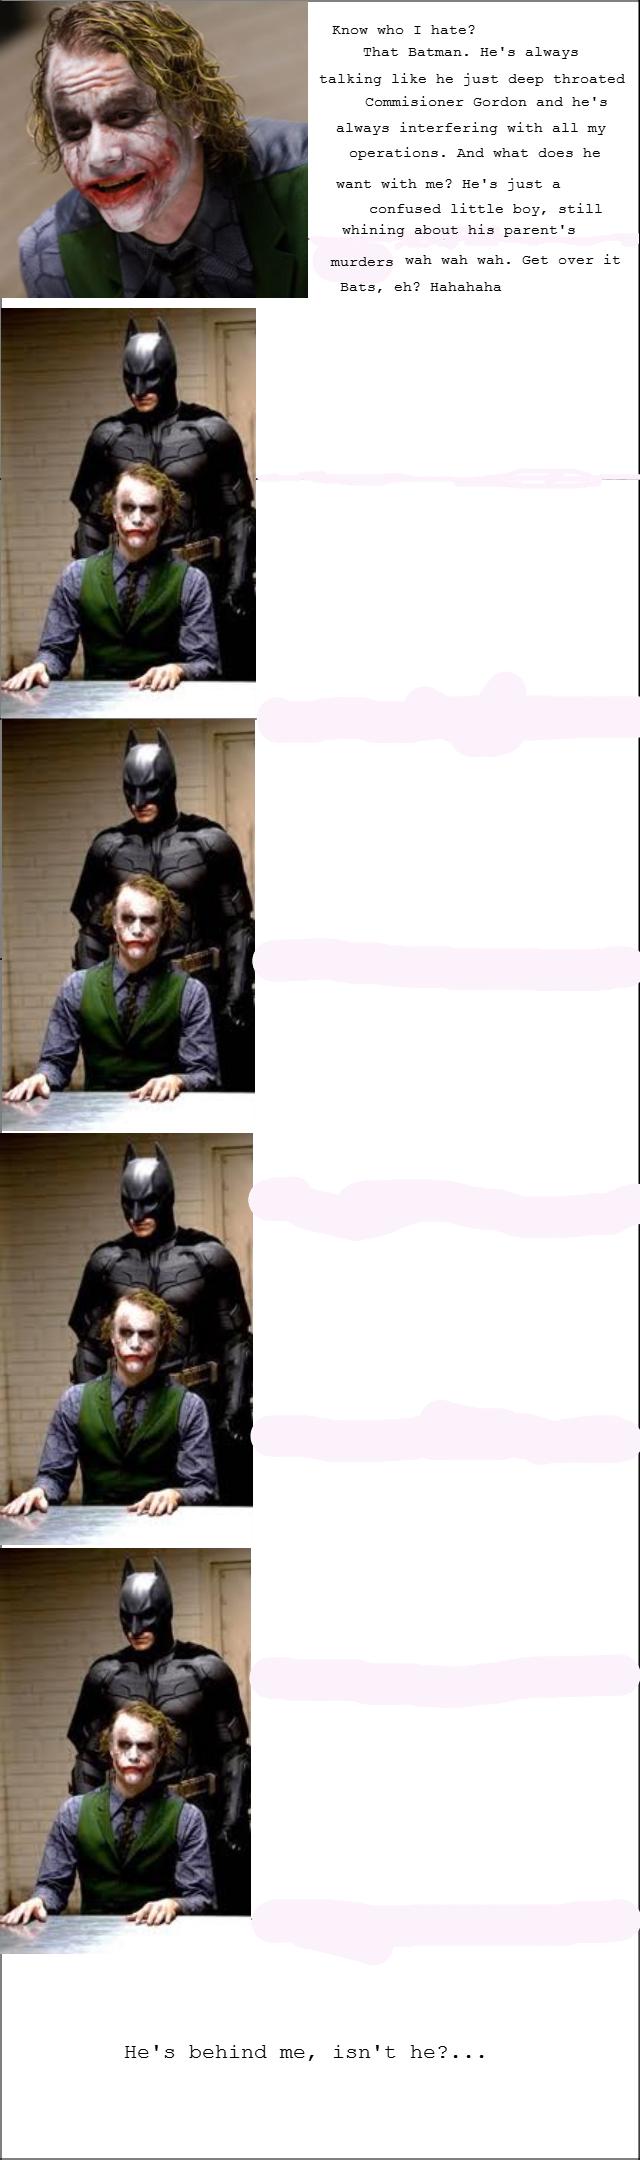 Joker's talking smack about Ol' Bats. ^. He' s behind me, Knew who T hate'? That Batman. He' s always talking like, he just deep threated trr: : srue: tr Eerder